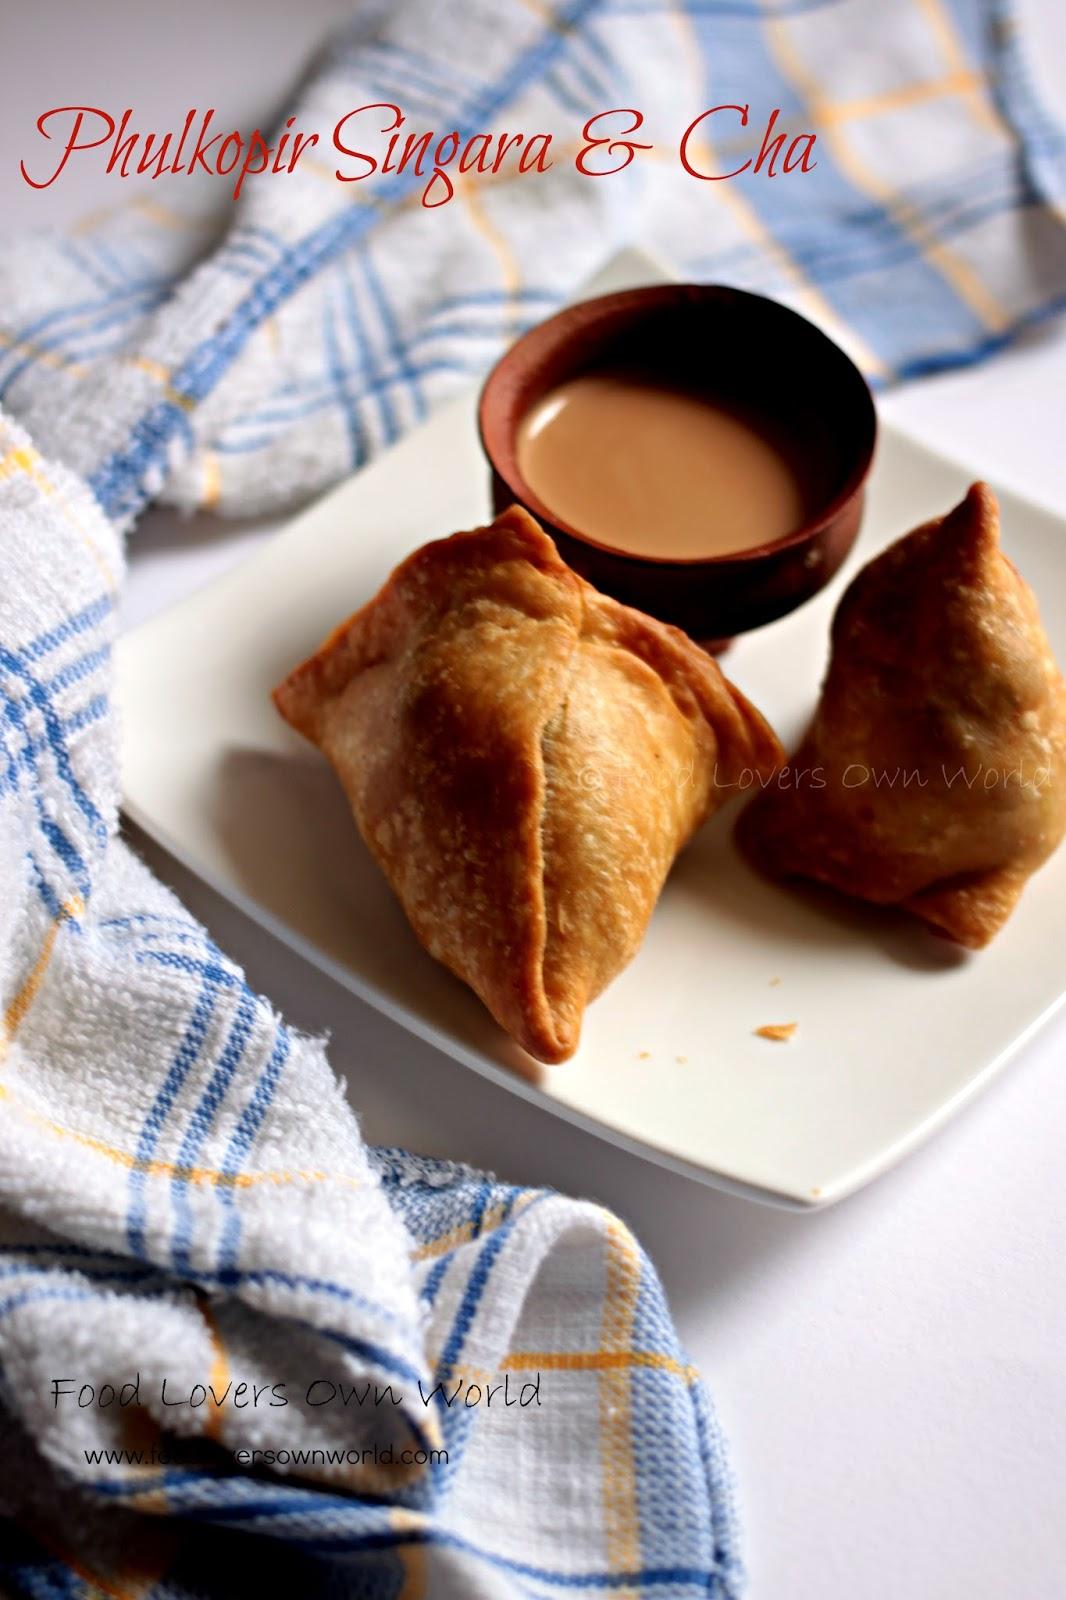 Food lovers own world singara bengali samosa singara bengali samosa forumfinder Image collections